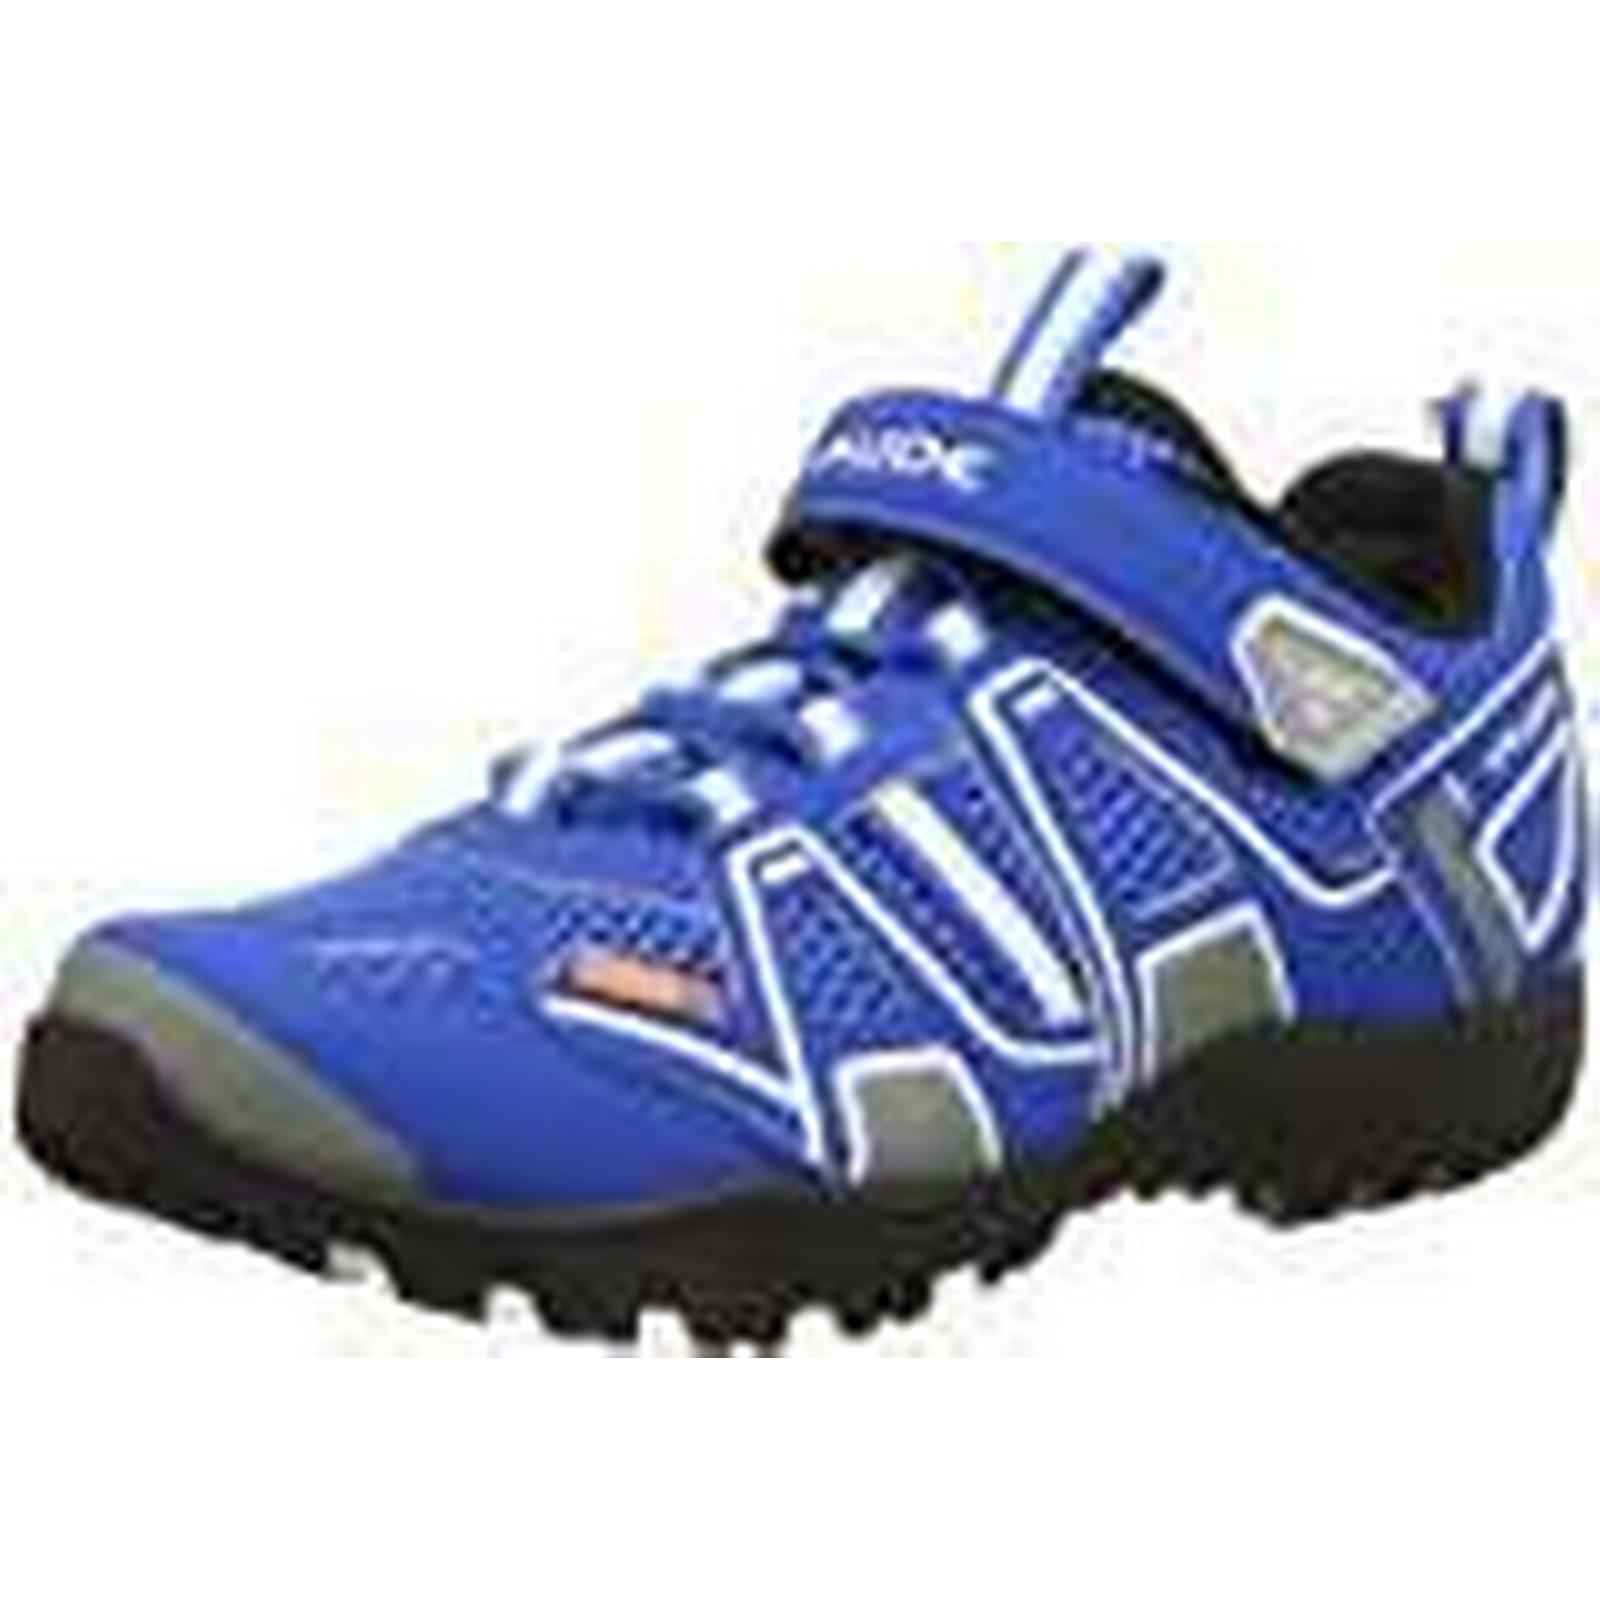 Vaude Yara Biking Tr, Unisex Adults' Mountain Biking Yara Shoes, Blue (Blue), 9 UK (43 EU) c0205b